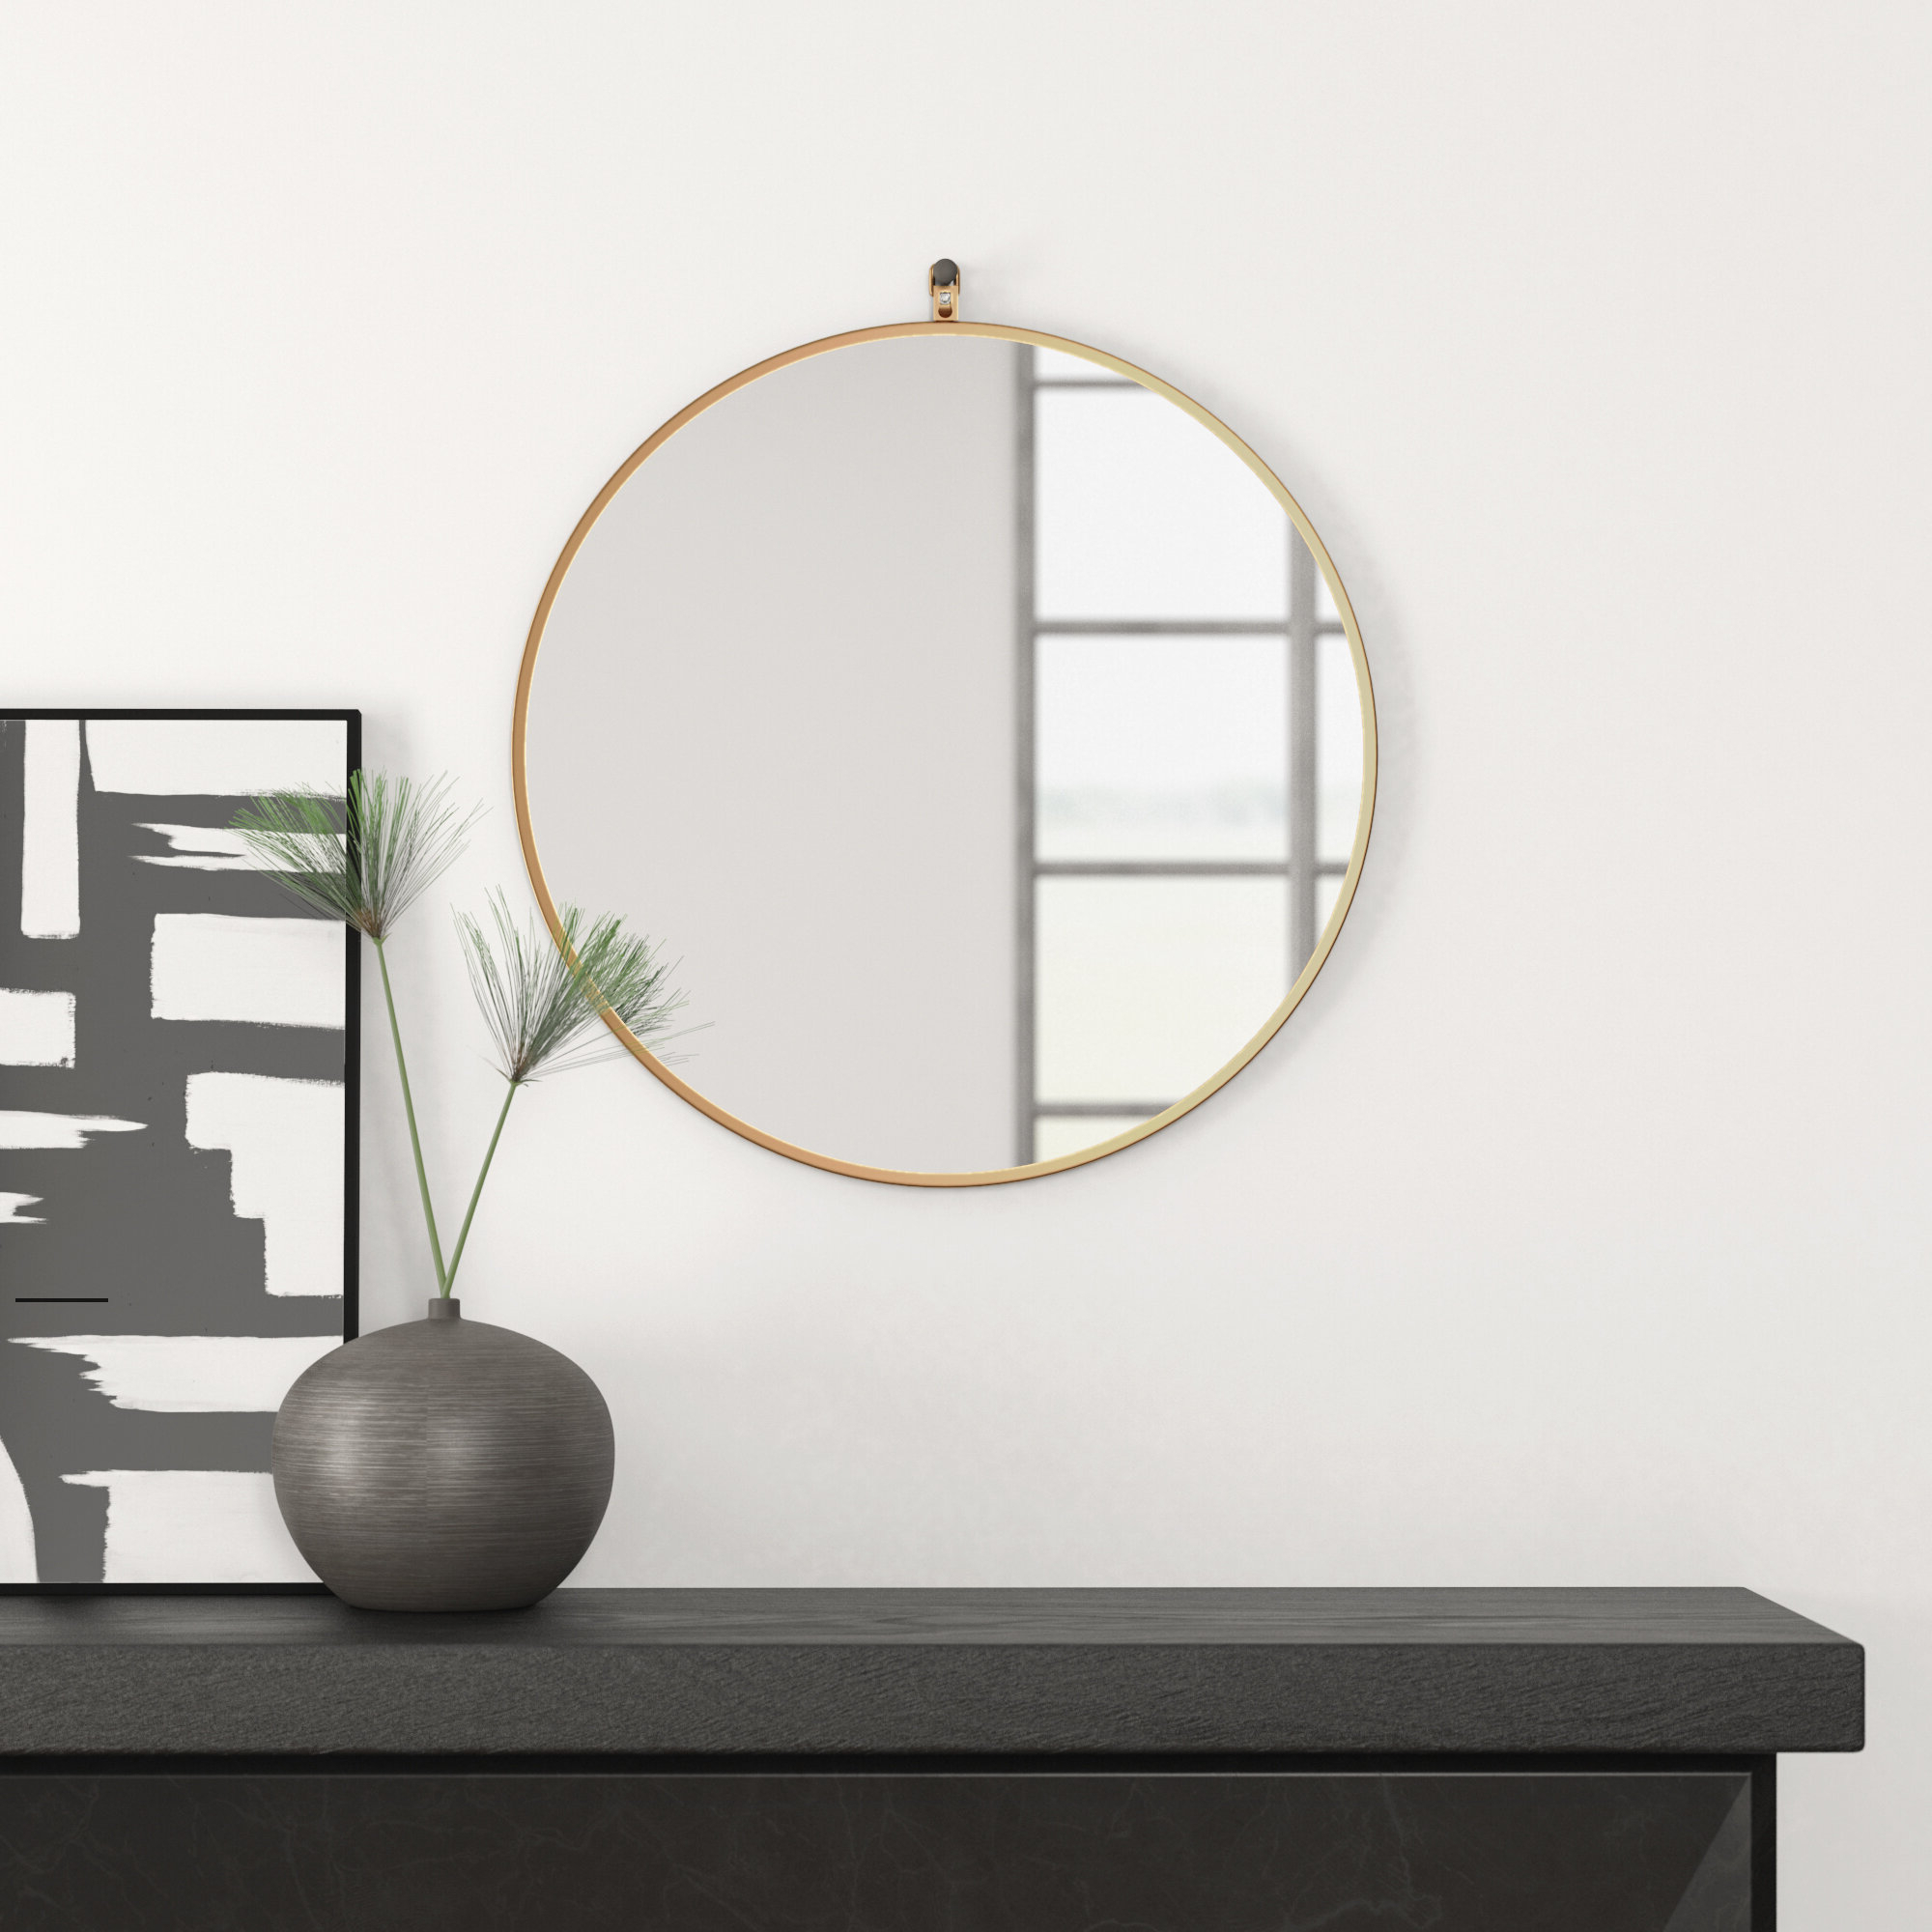 Newest Yedinak Modern Distressed Accent Mirror In Minerva Accent Mirrors (Gallery 16 of 20)